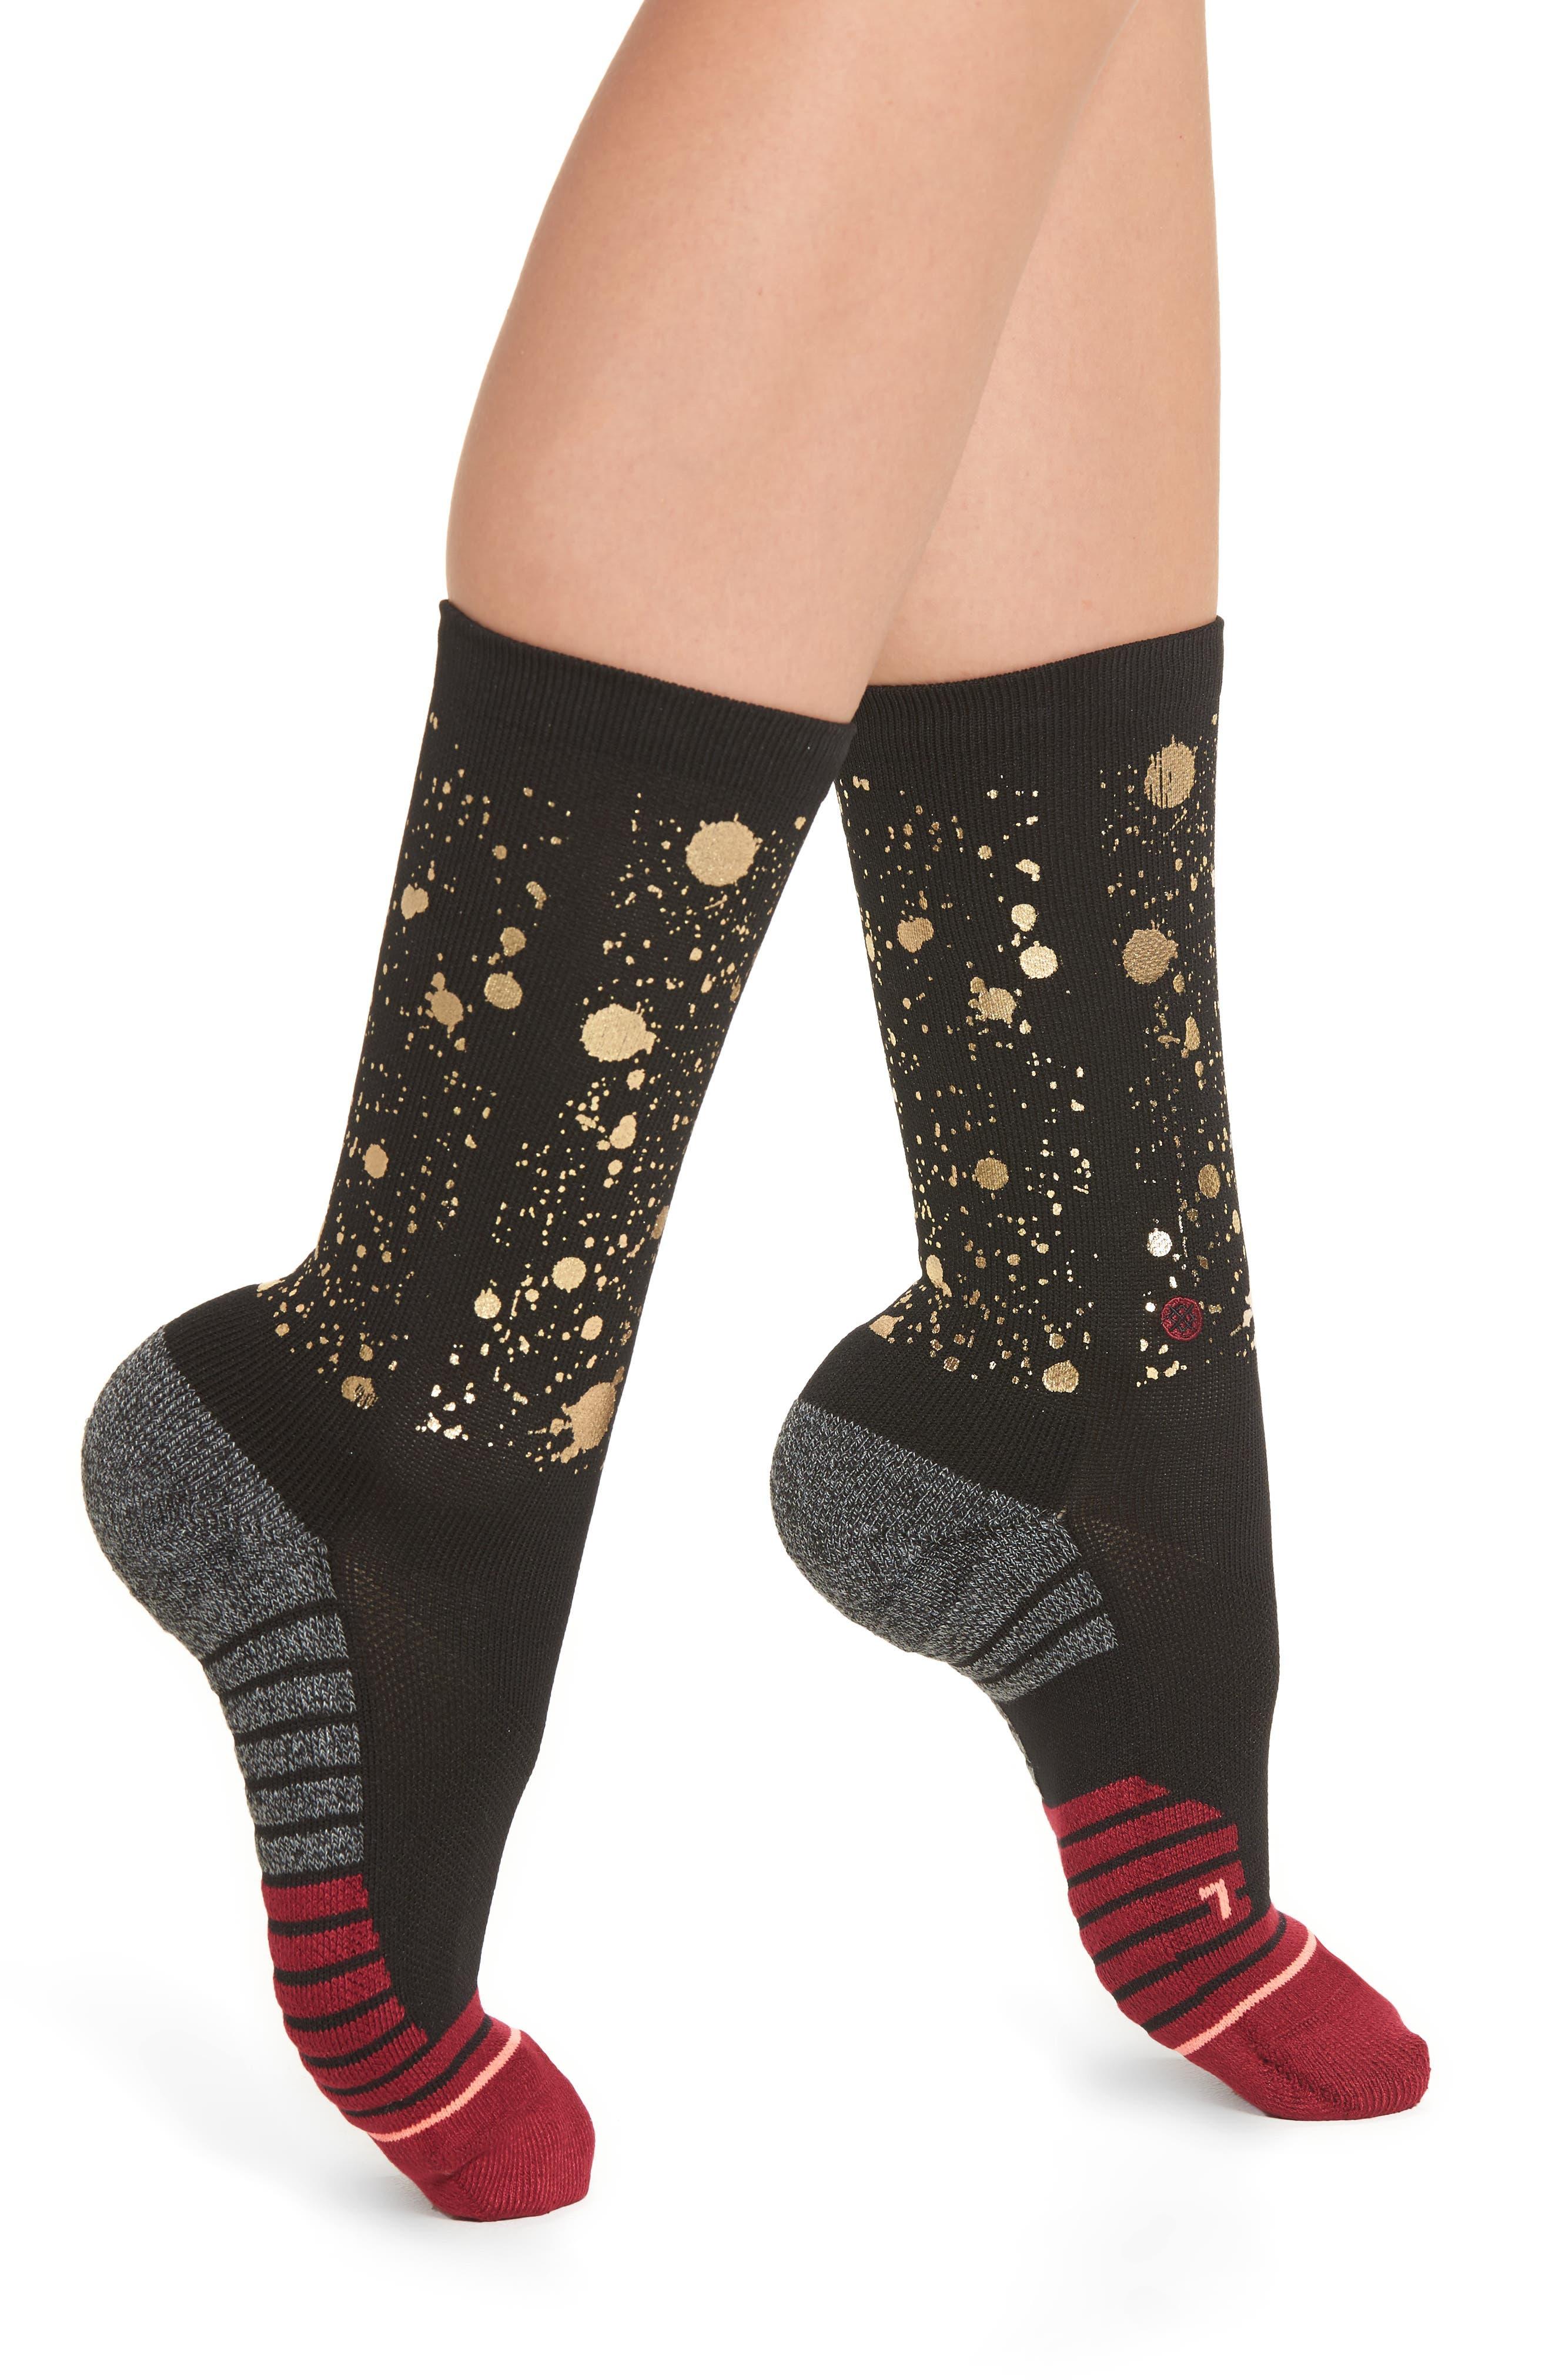 Endorphin Training Socks,                             Main thumbnail 1, color,                             001